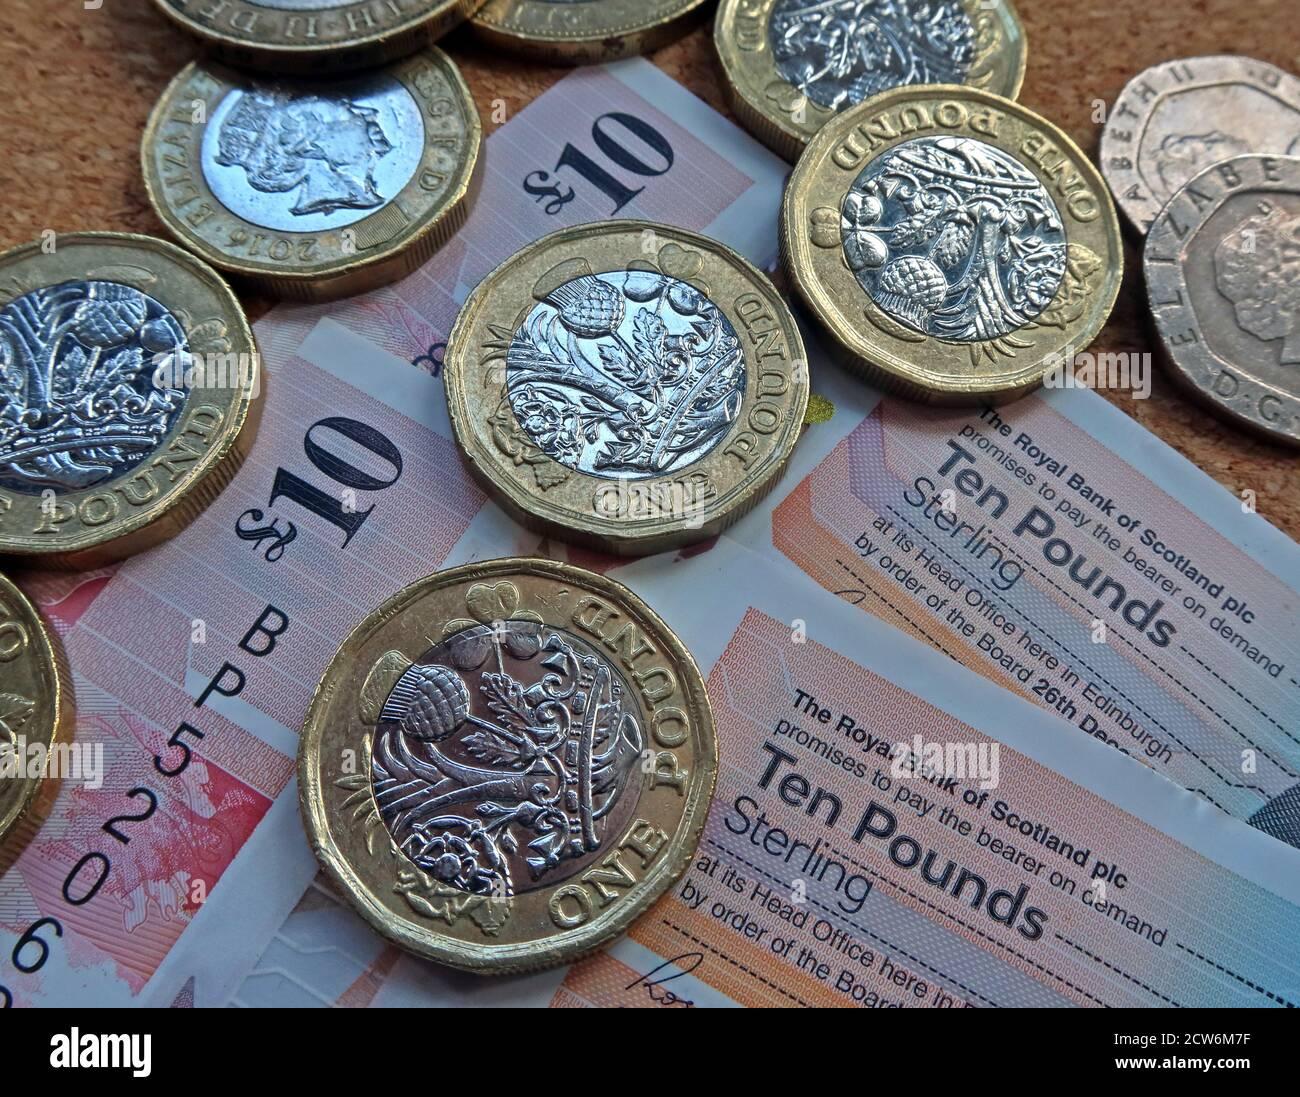 GoTonySmith,HotpixUK,@HotpixUK,money,cash,Scottish,Scotish,notes,coin,change,HBOS,BOS,Banknote,banknotes,note,bank note,pound,sterling,pounds,Scottish Sterling currency,Scottish Sterling,currency,pound coins,The Royal bank of Scotland PLC,PLC,The Royal bank of Scotland,ten Pound note,ten Pound notes,tenner,plastic notes,plastic